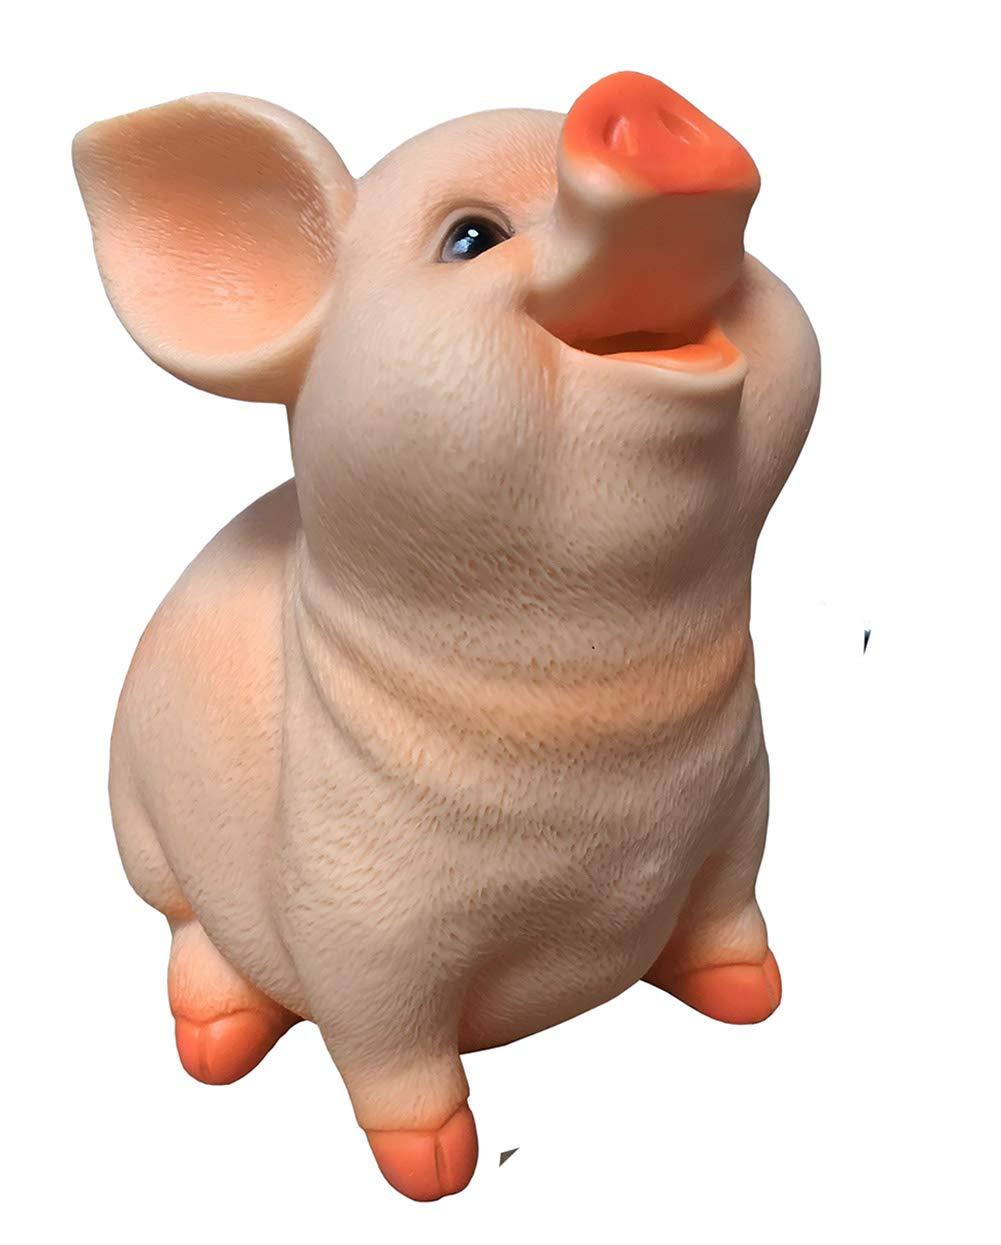 Mysika Pig Piggy Bankホーム樹脂クラフトOrnamentsお金ボックス現金コインバンクfor Boys Girls   B07CZD9G6J